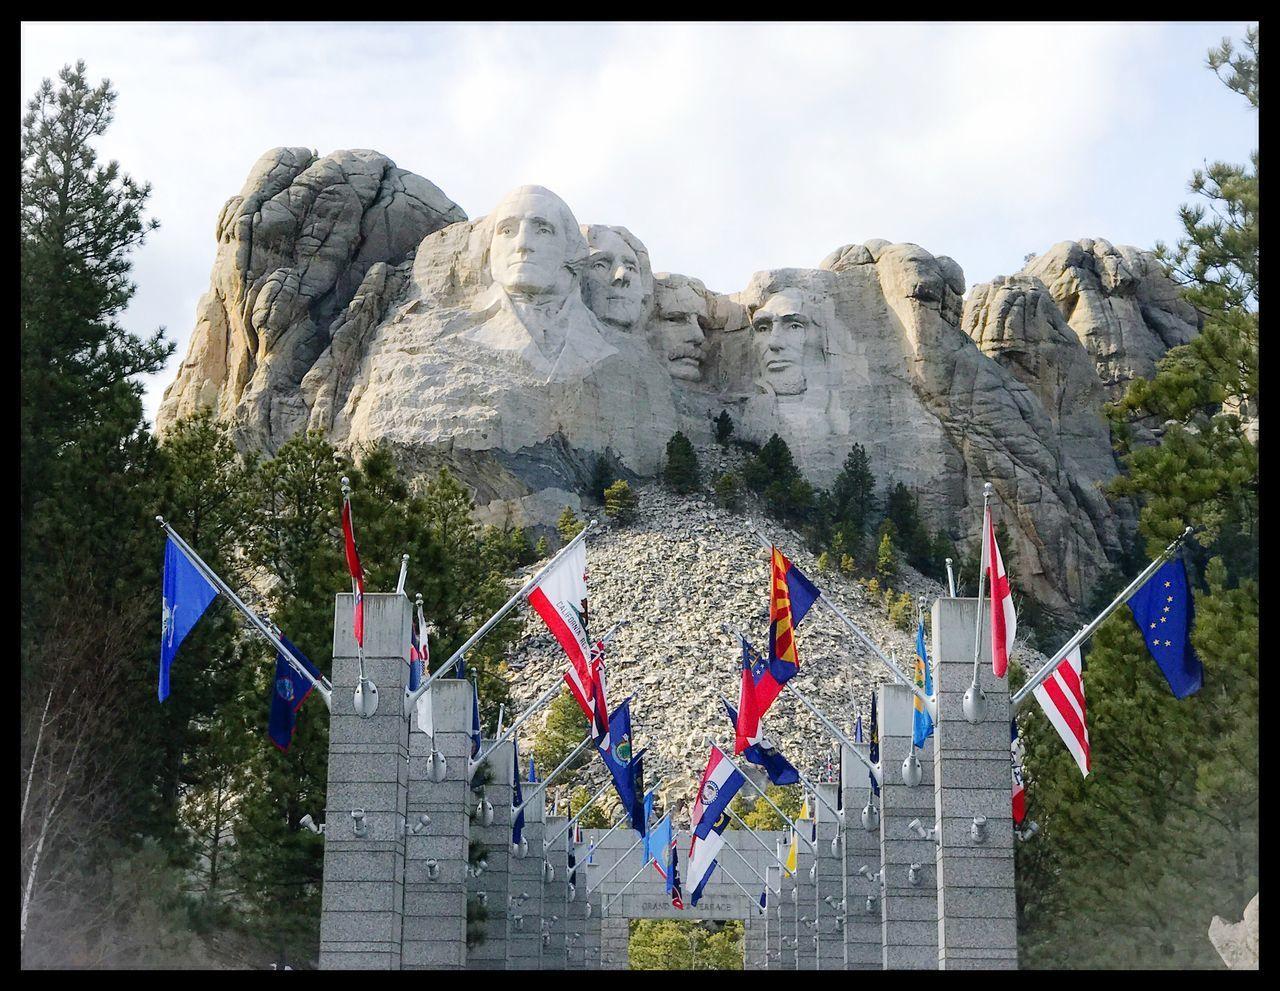 Great Faces Sculpture Mountain American Mt. Rushmore Scenic View Cold Temperature South Dakota.